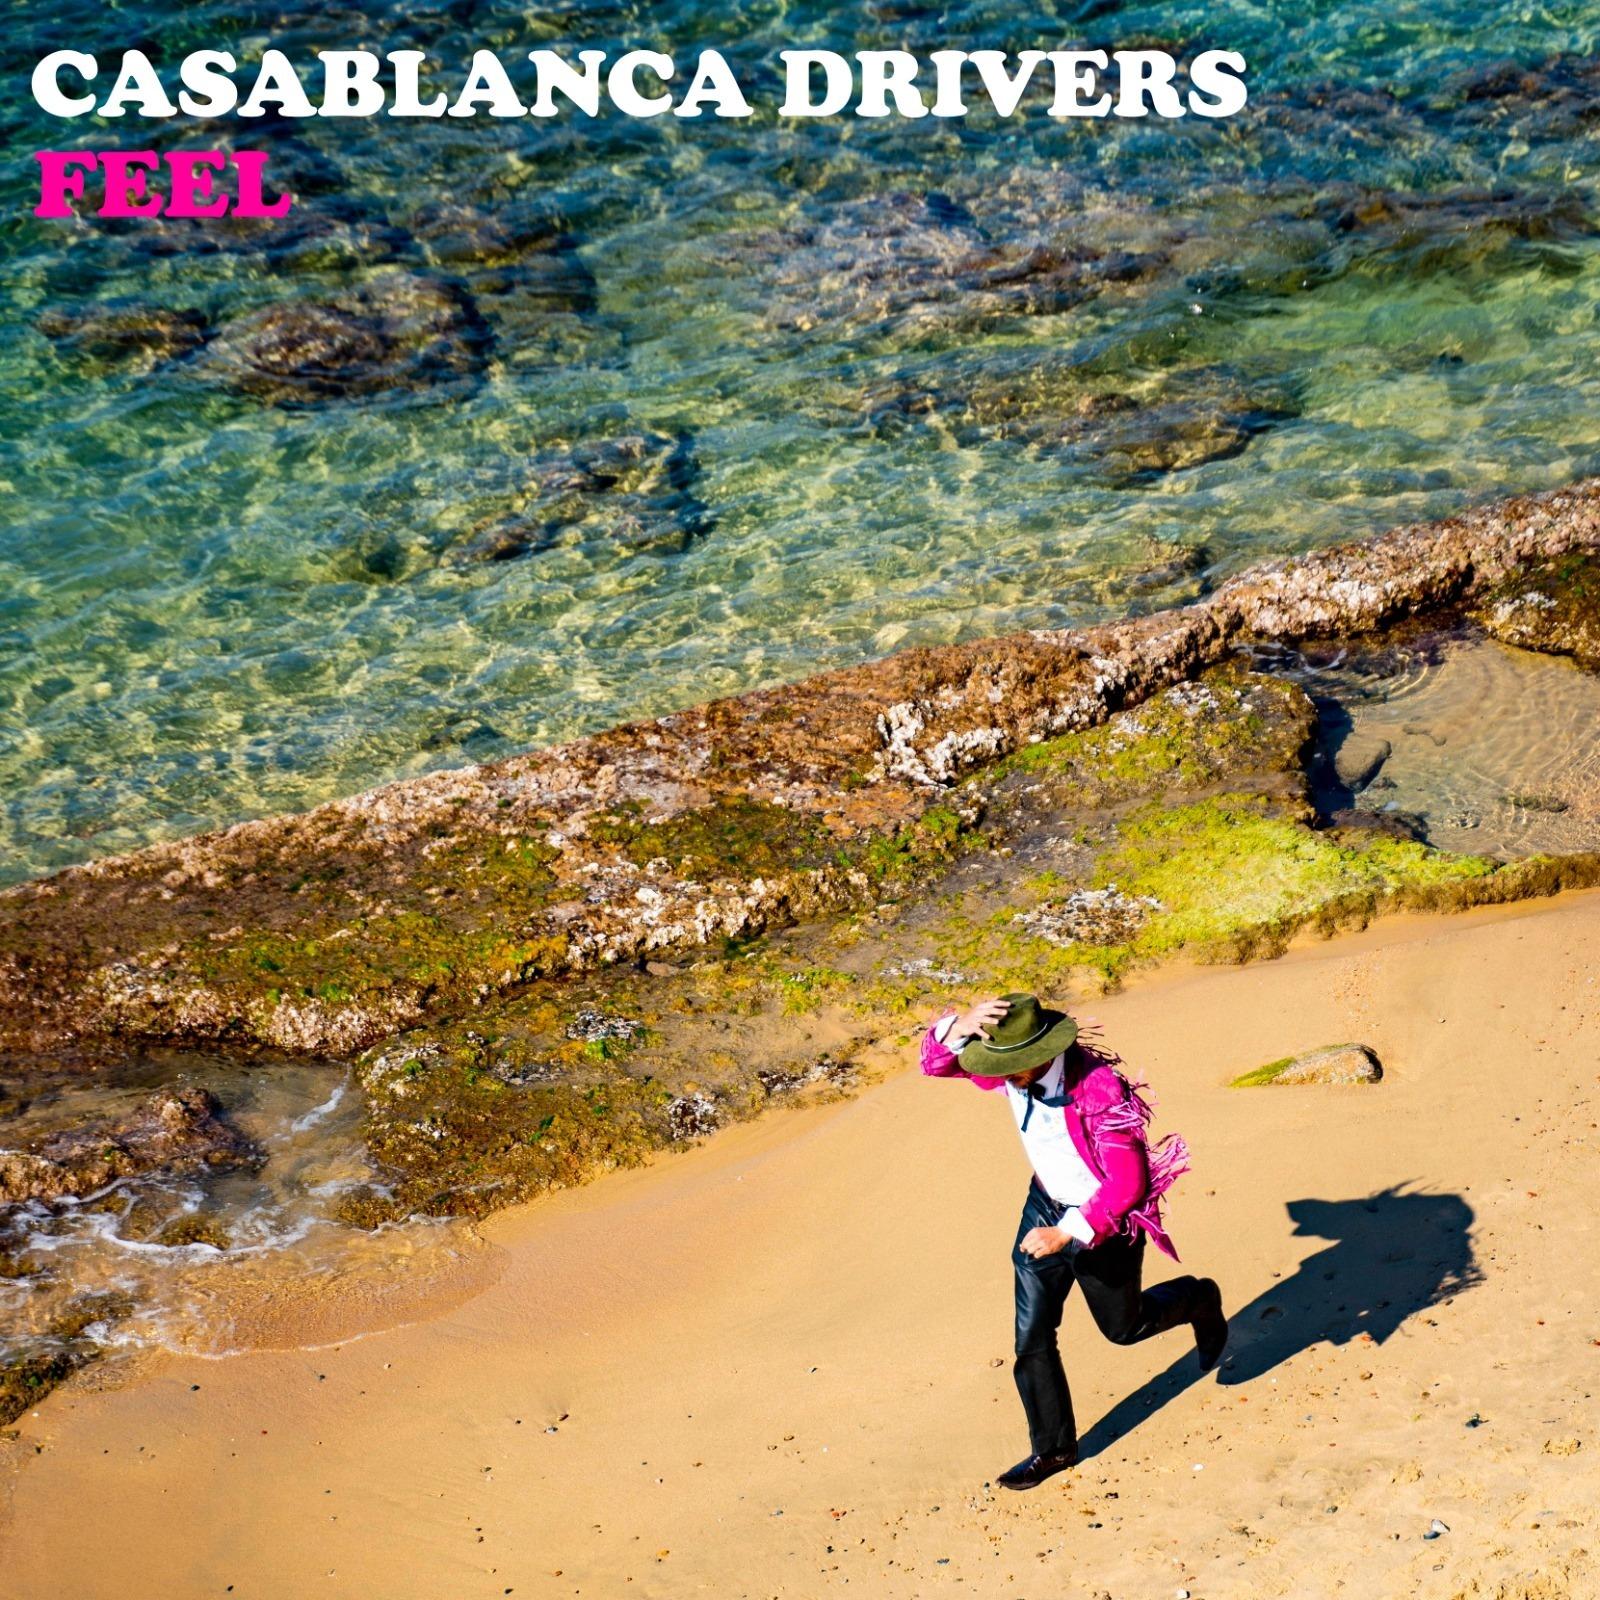 Casablanca Drivers